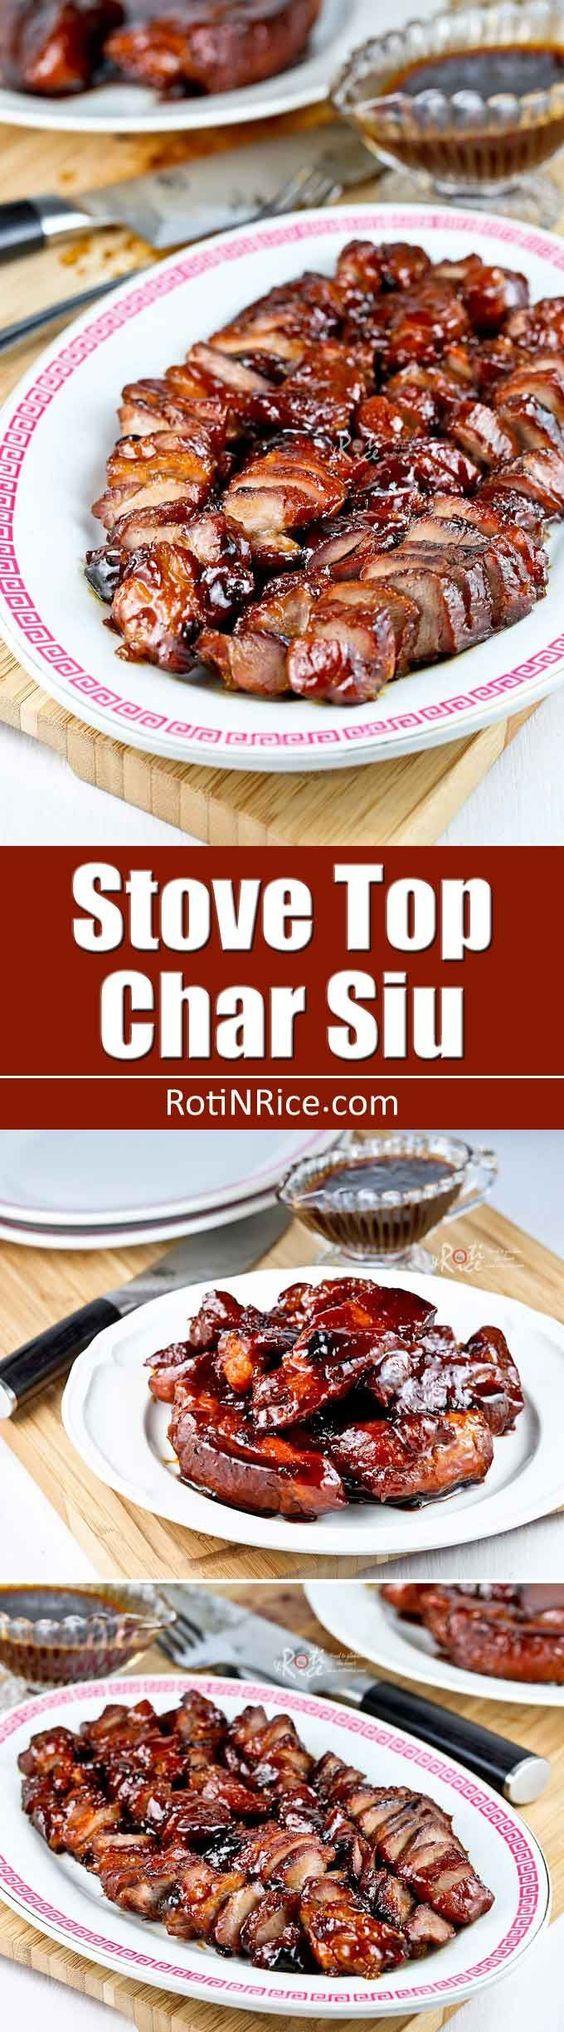 Stove Top Char Siu (Chinese BBQ Pork)